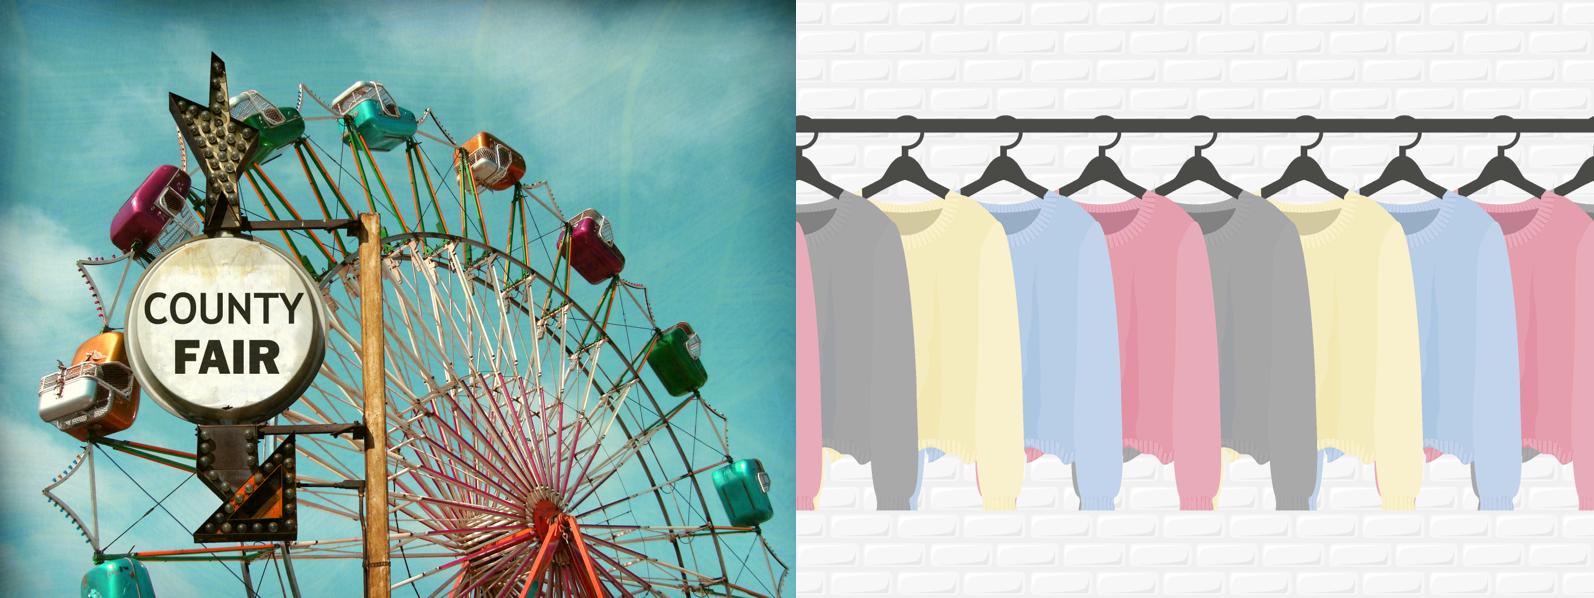 county-fair-and-sweatshirts